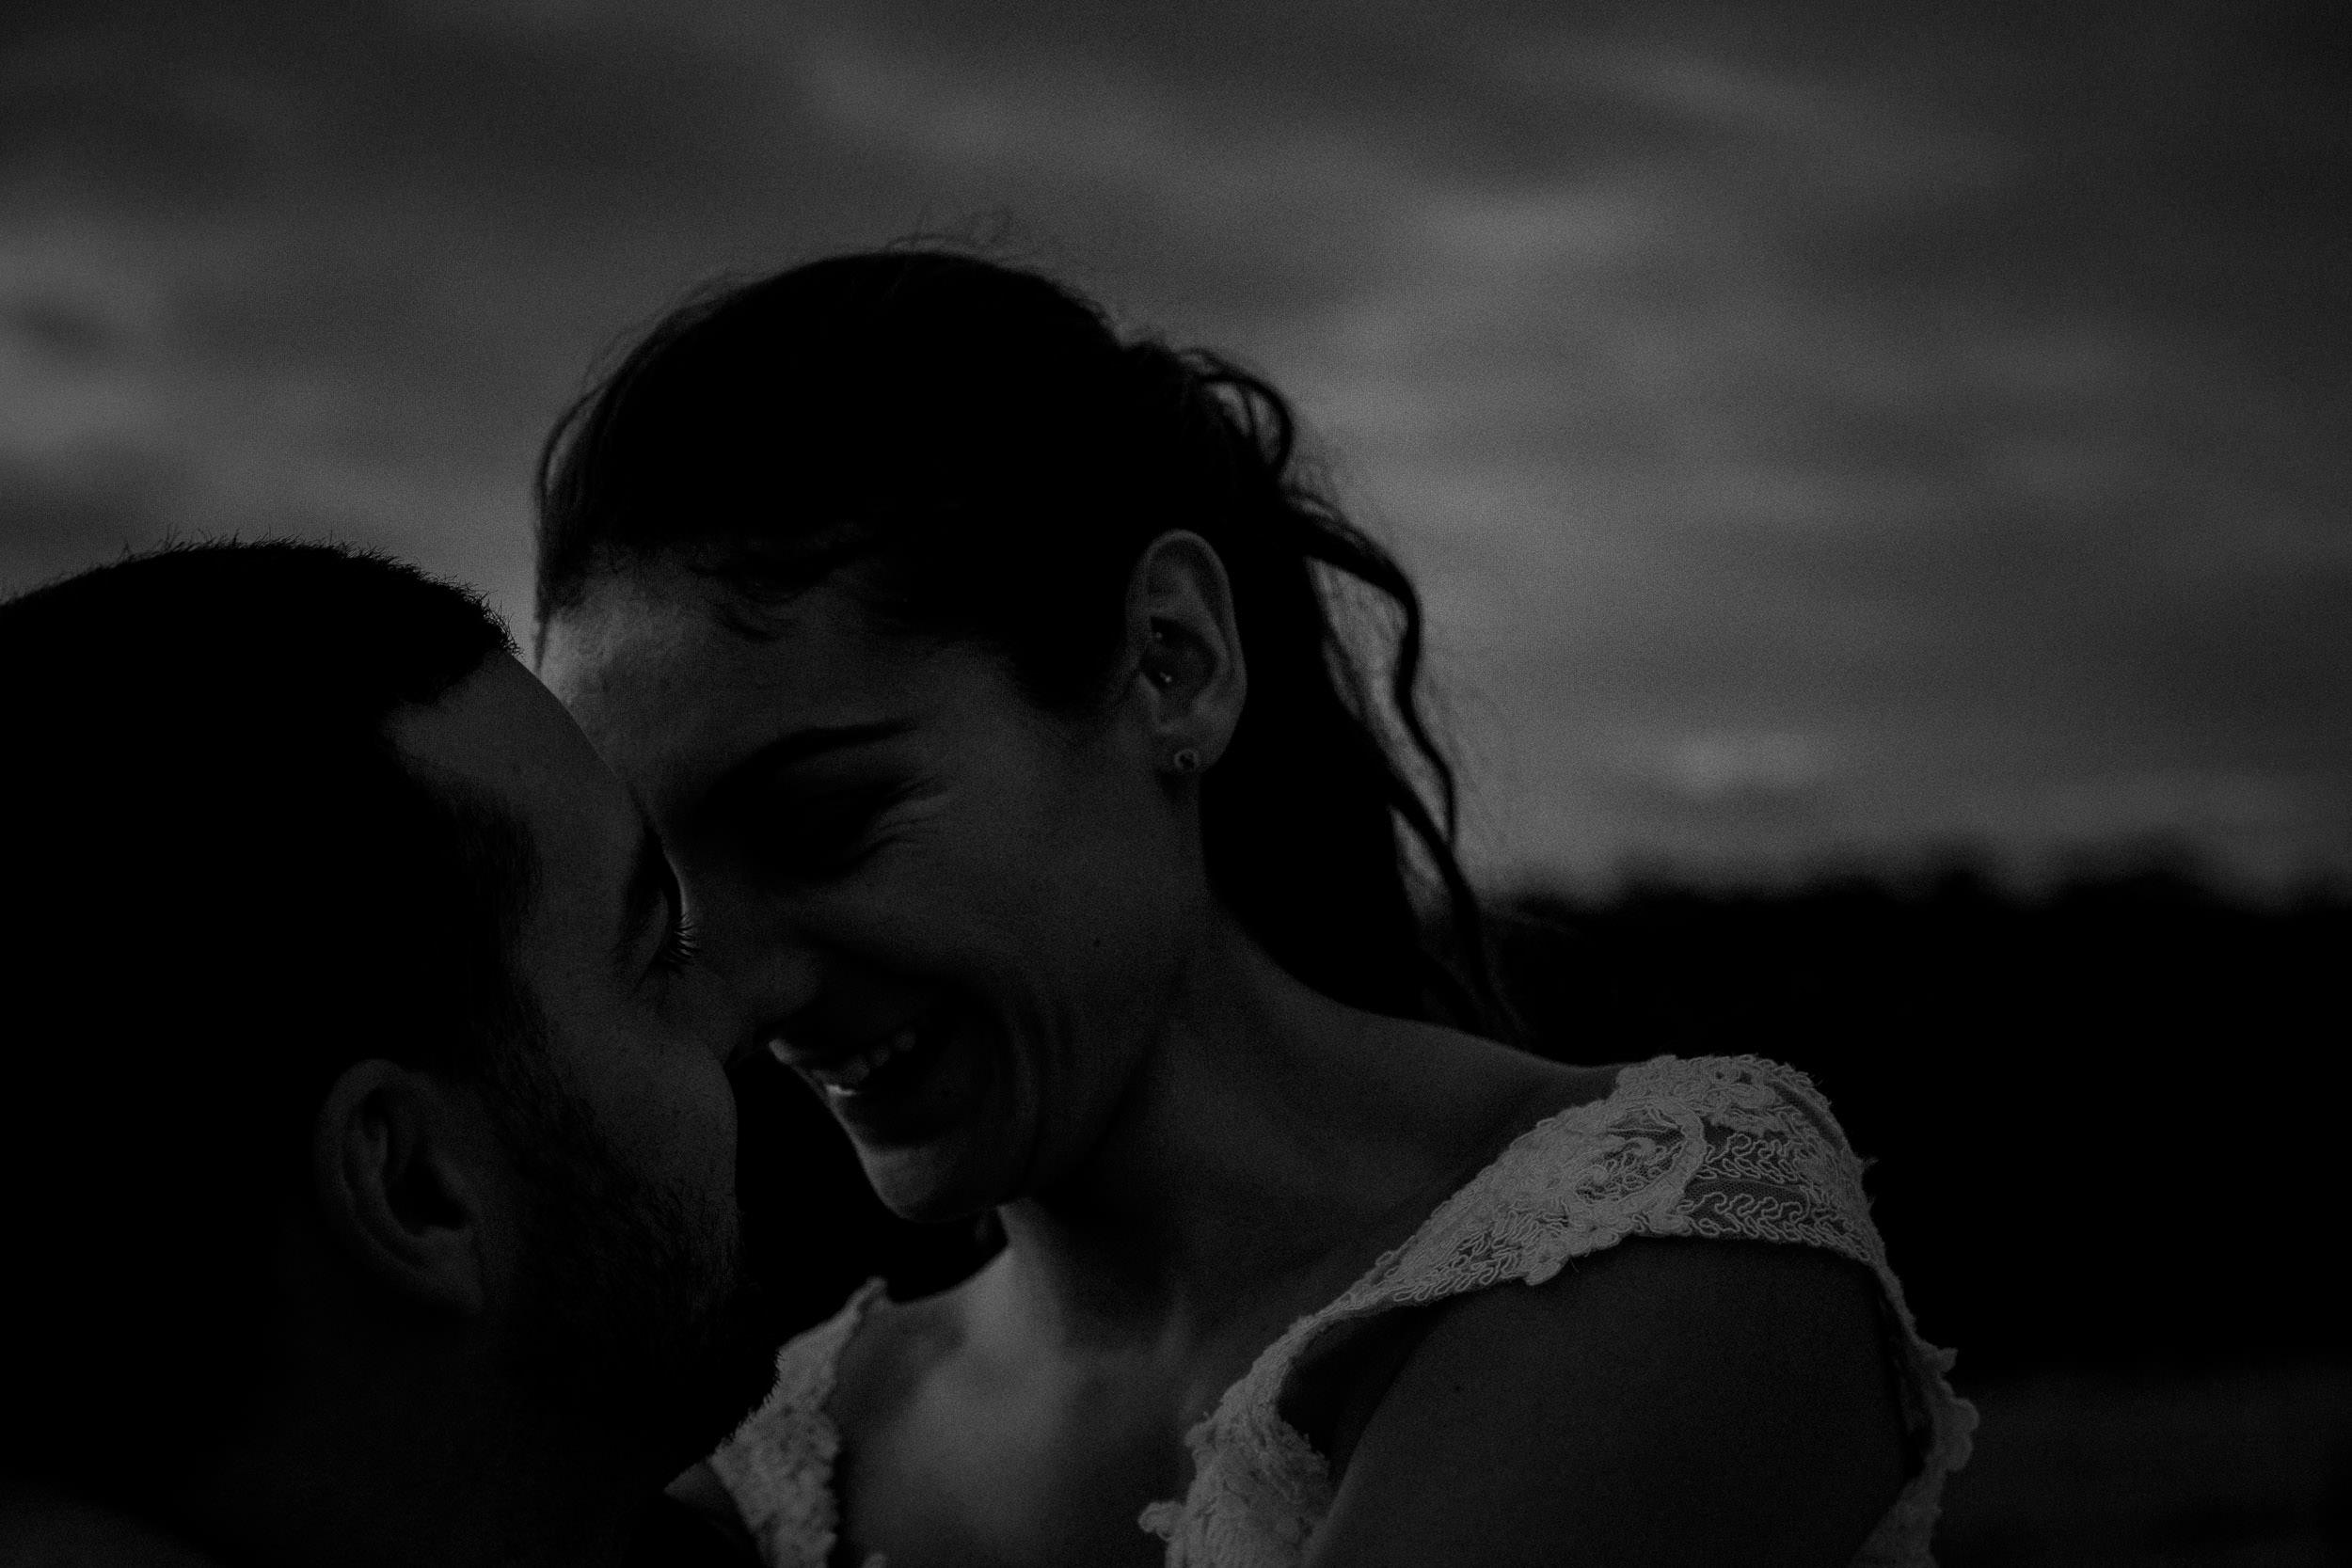 g_c wedding - kings _ thieves elopement wedding photography - blog 91.jpg